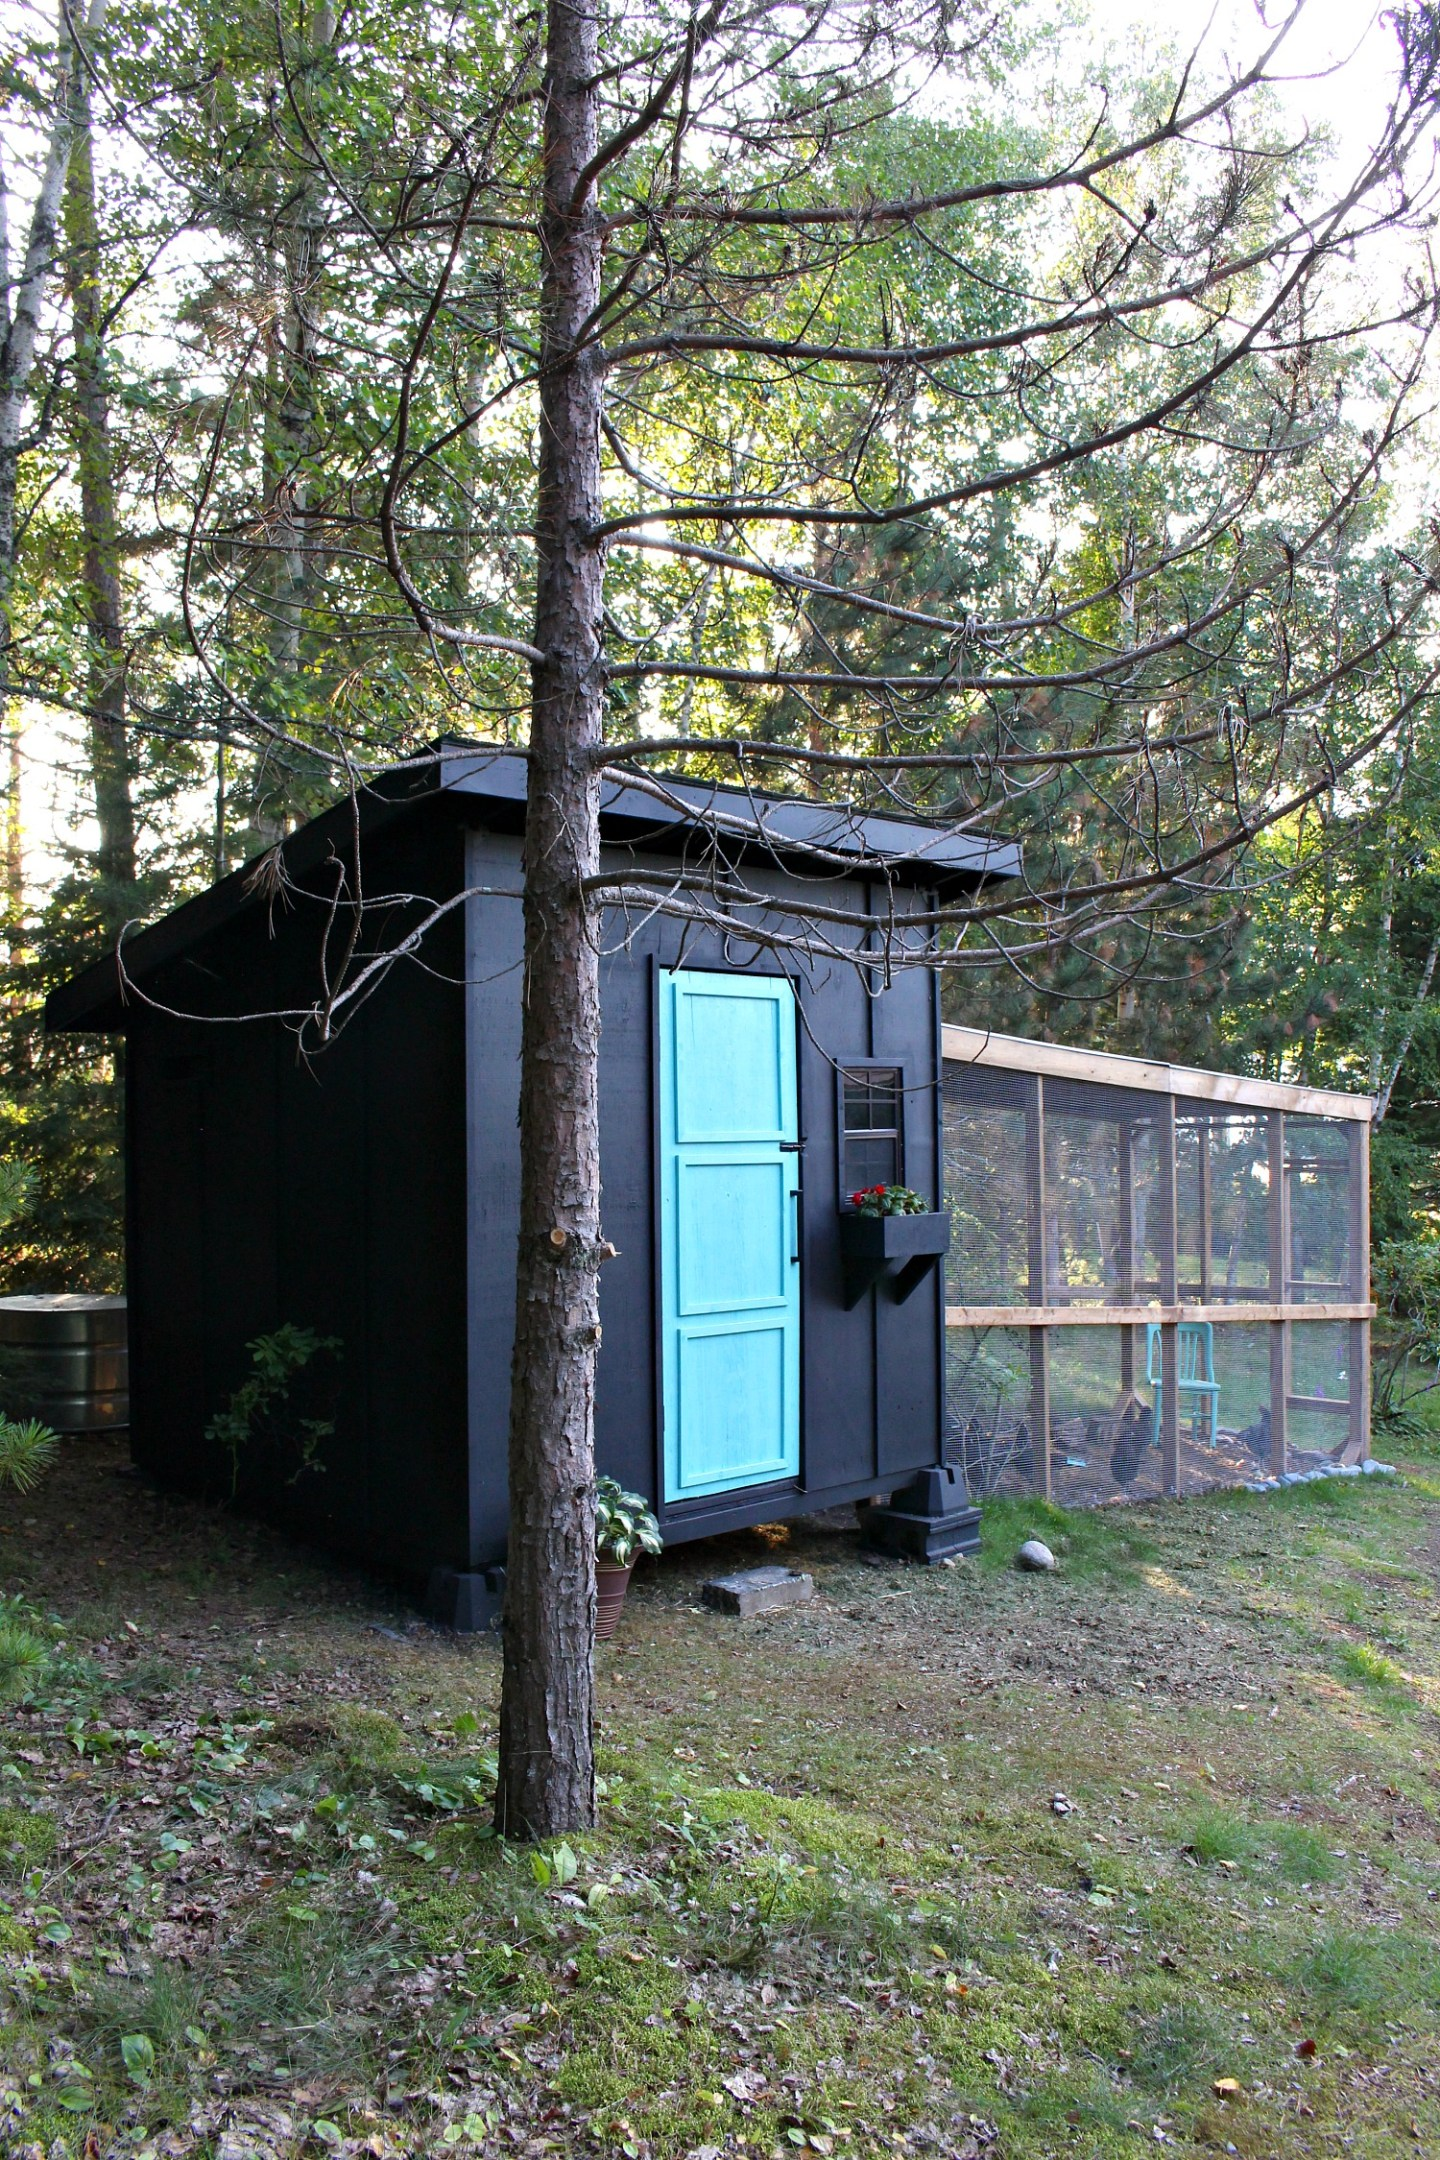 Modern Black Chicken Coop Design with Covered Run and Aqua Door